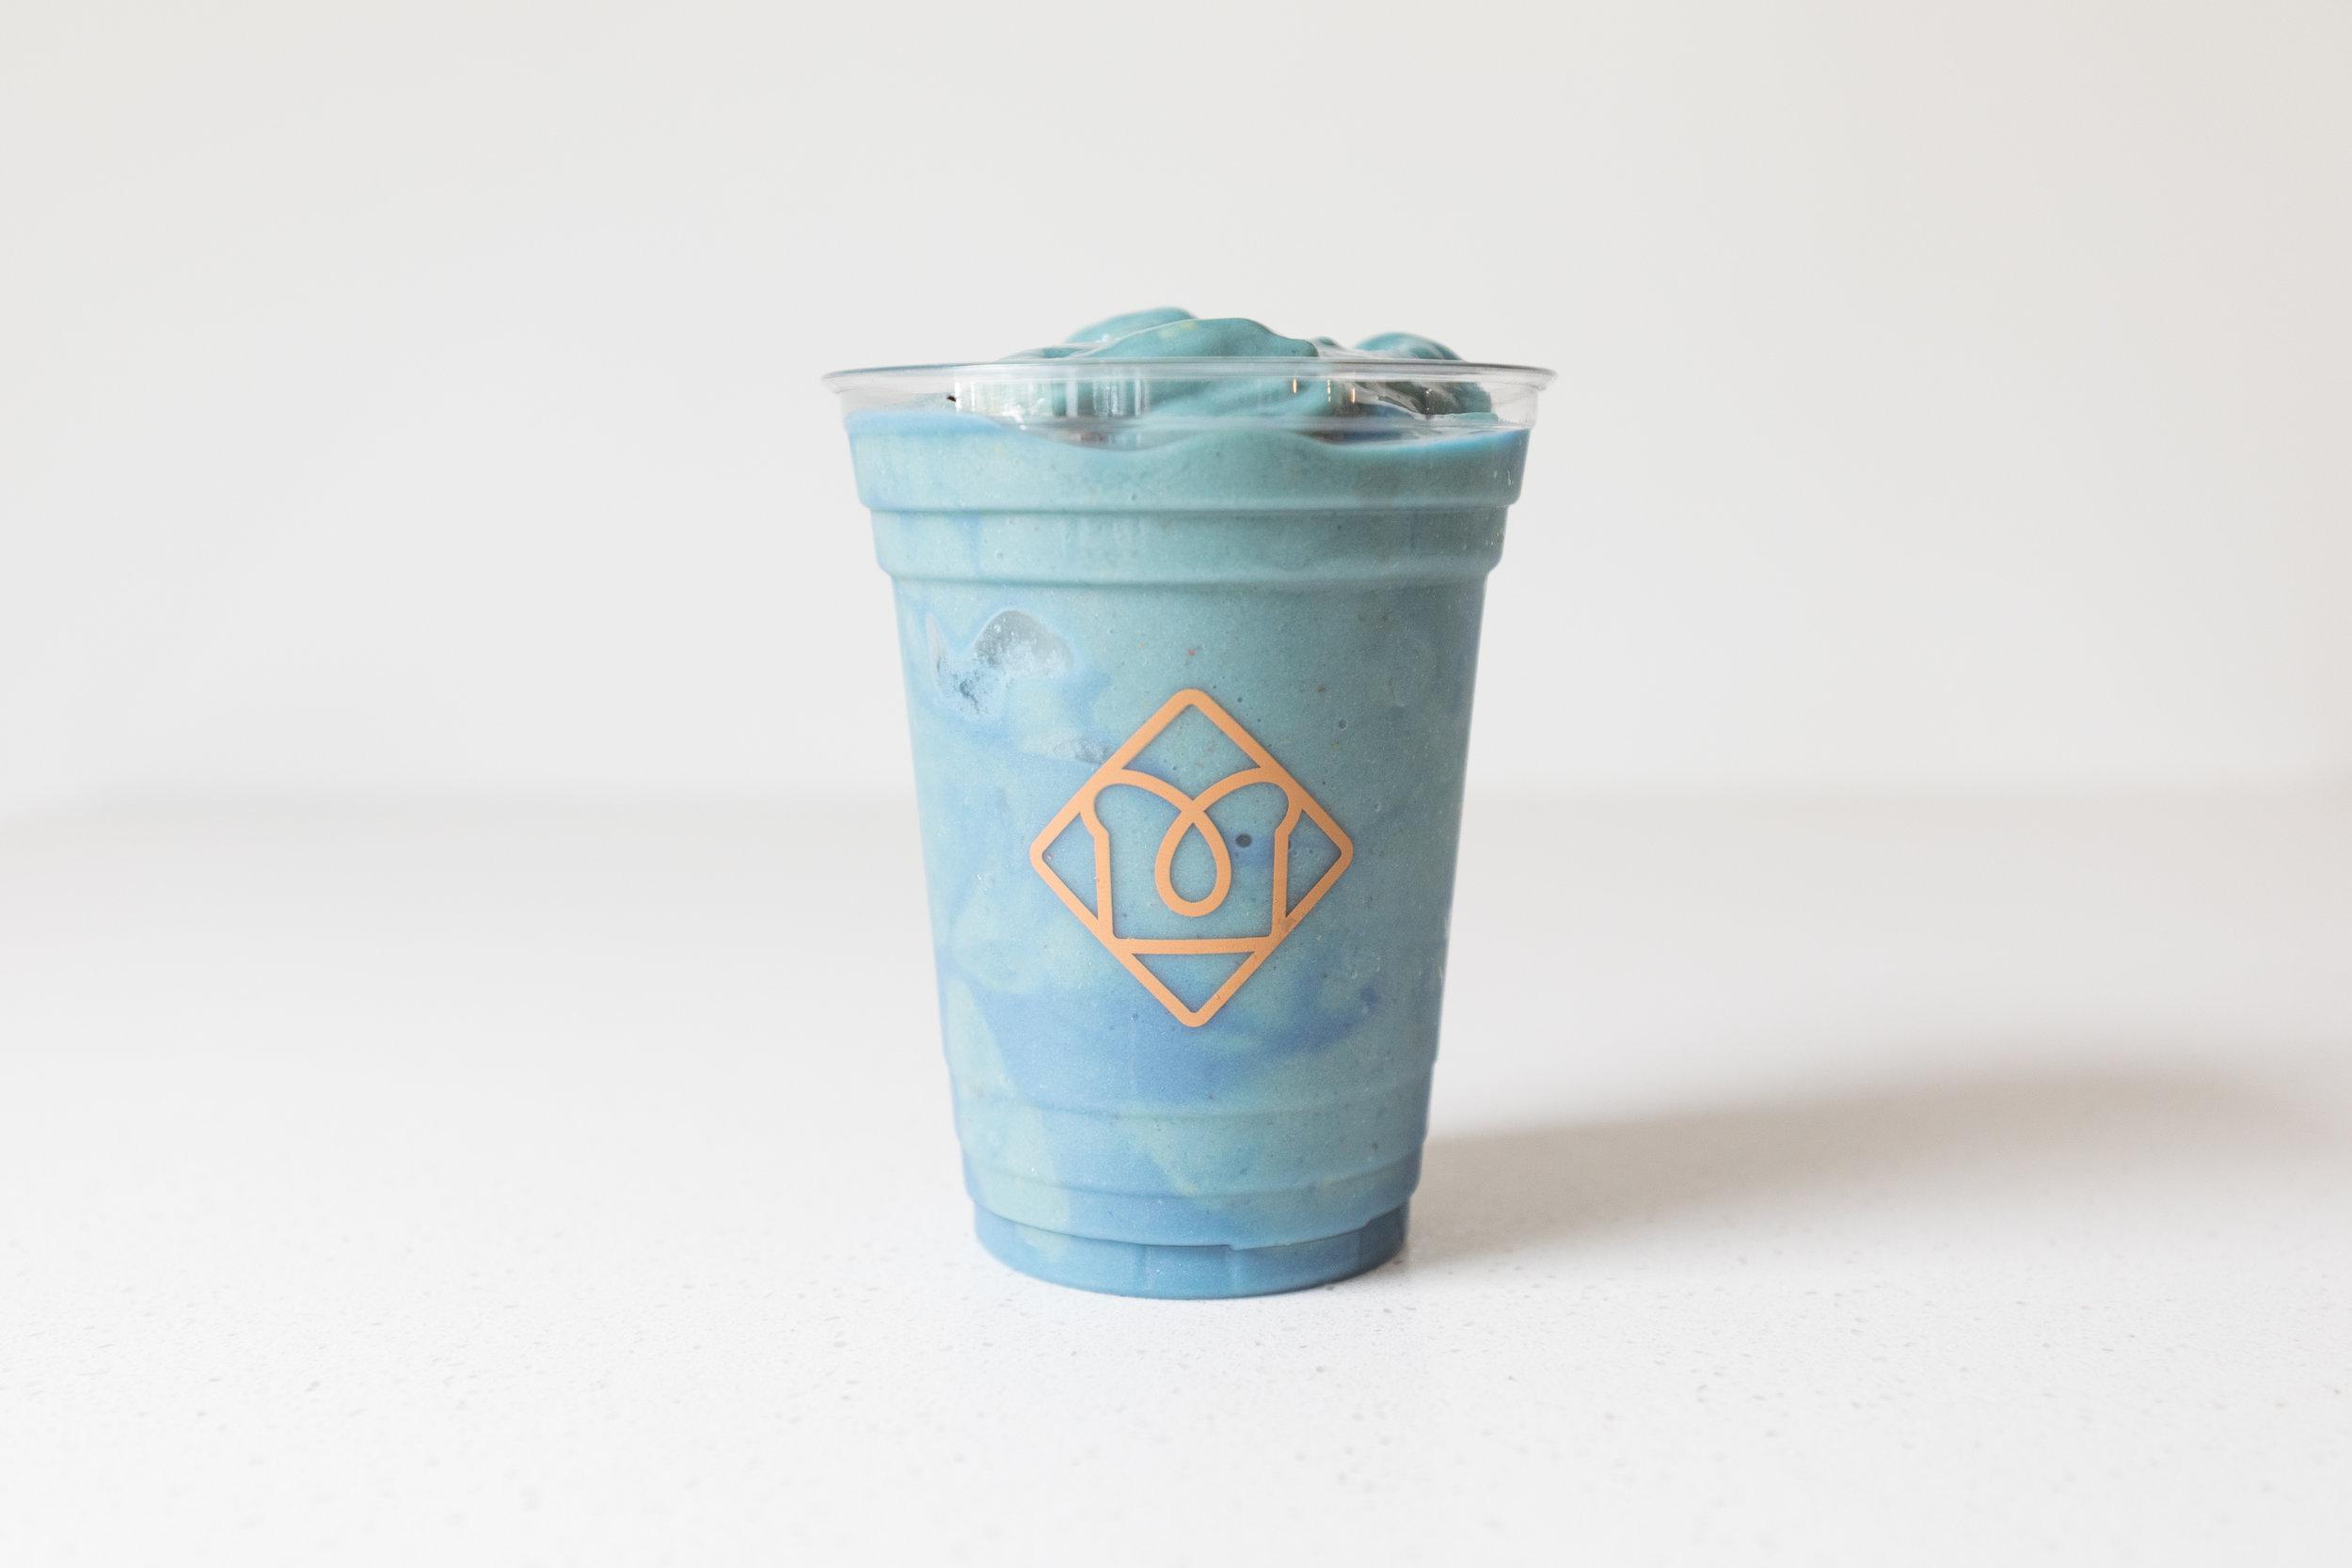 Blue Majik : Blue Majik / Banana / Pineapple / Mango / Almond Milk